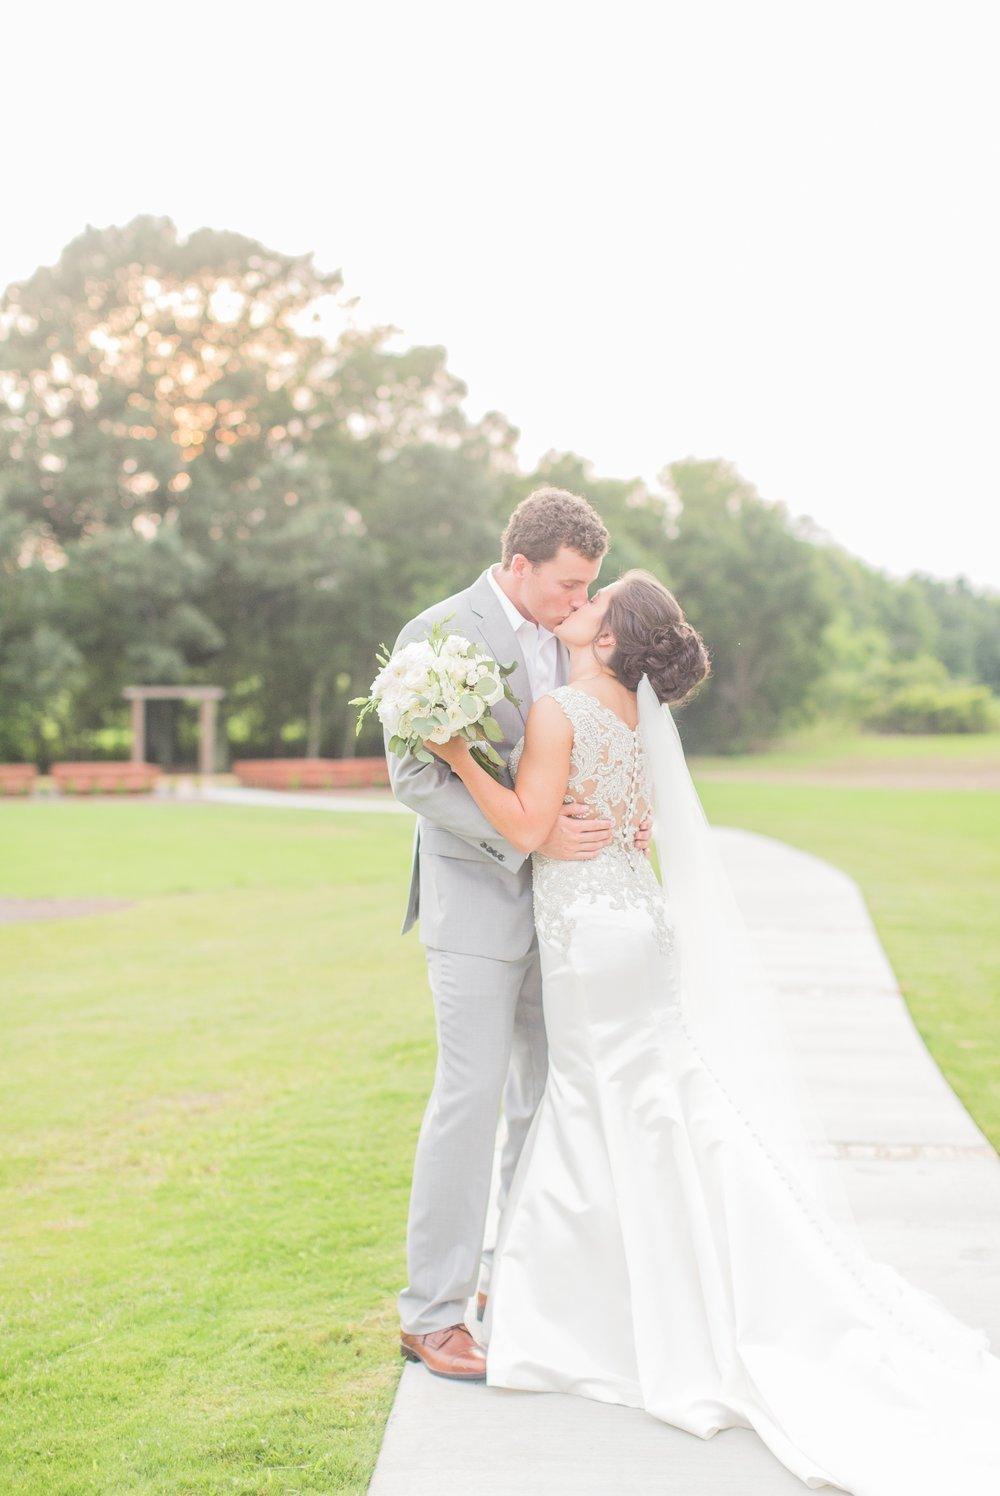 bridlewood-of-madison-mississippi-wedding 55.jpg